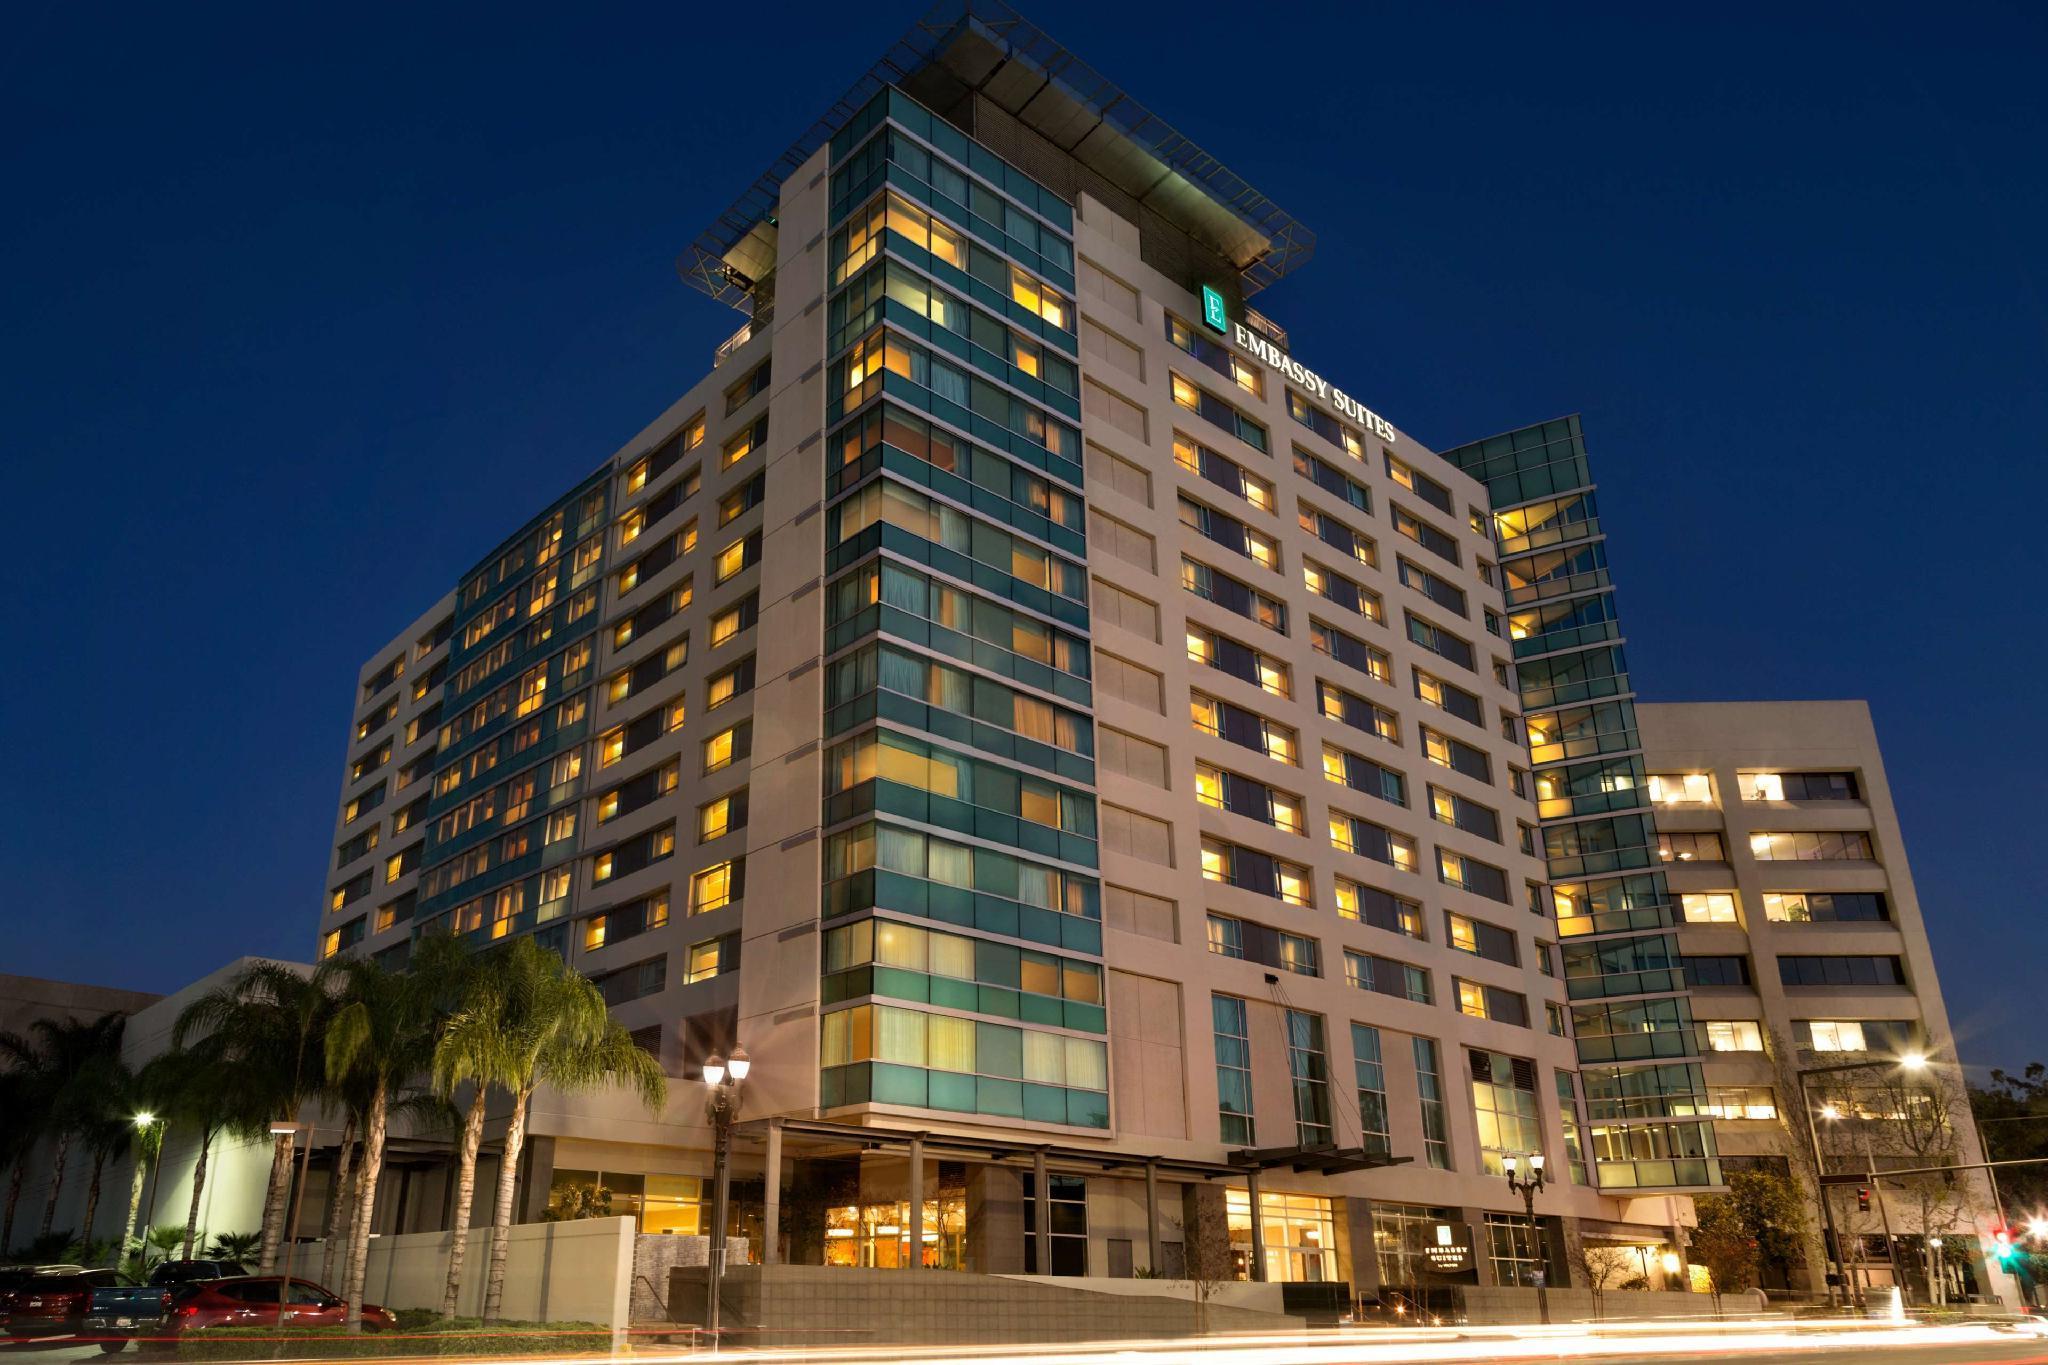 Embassy Suites Los Angeles Glendale Hotel